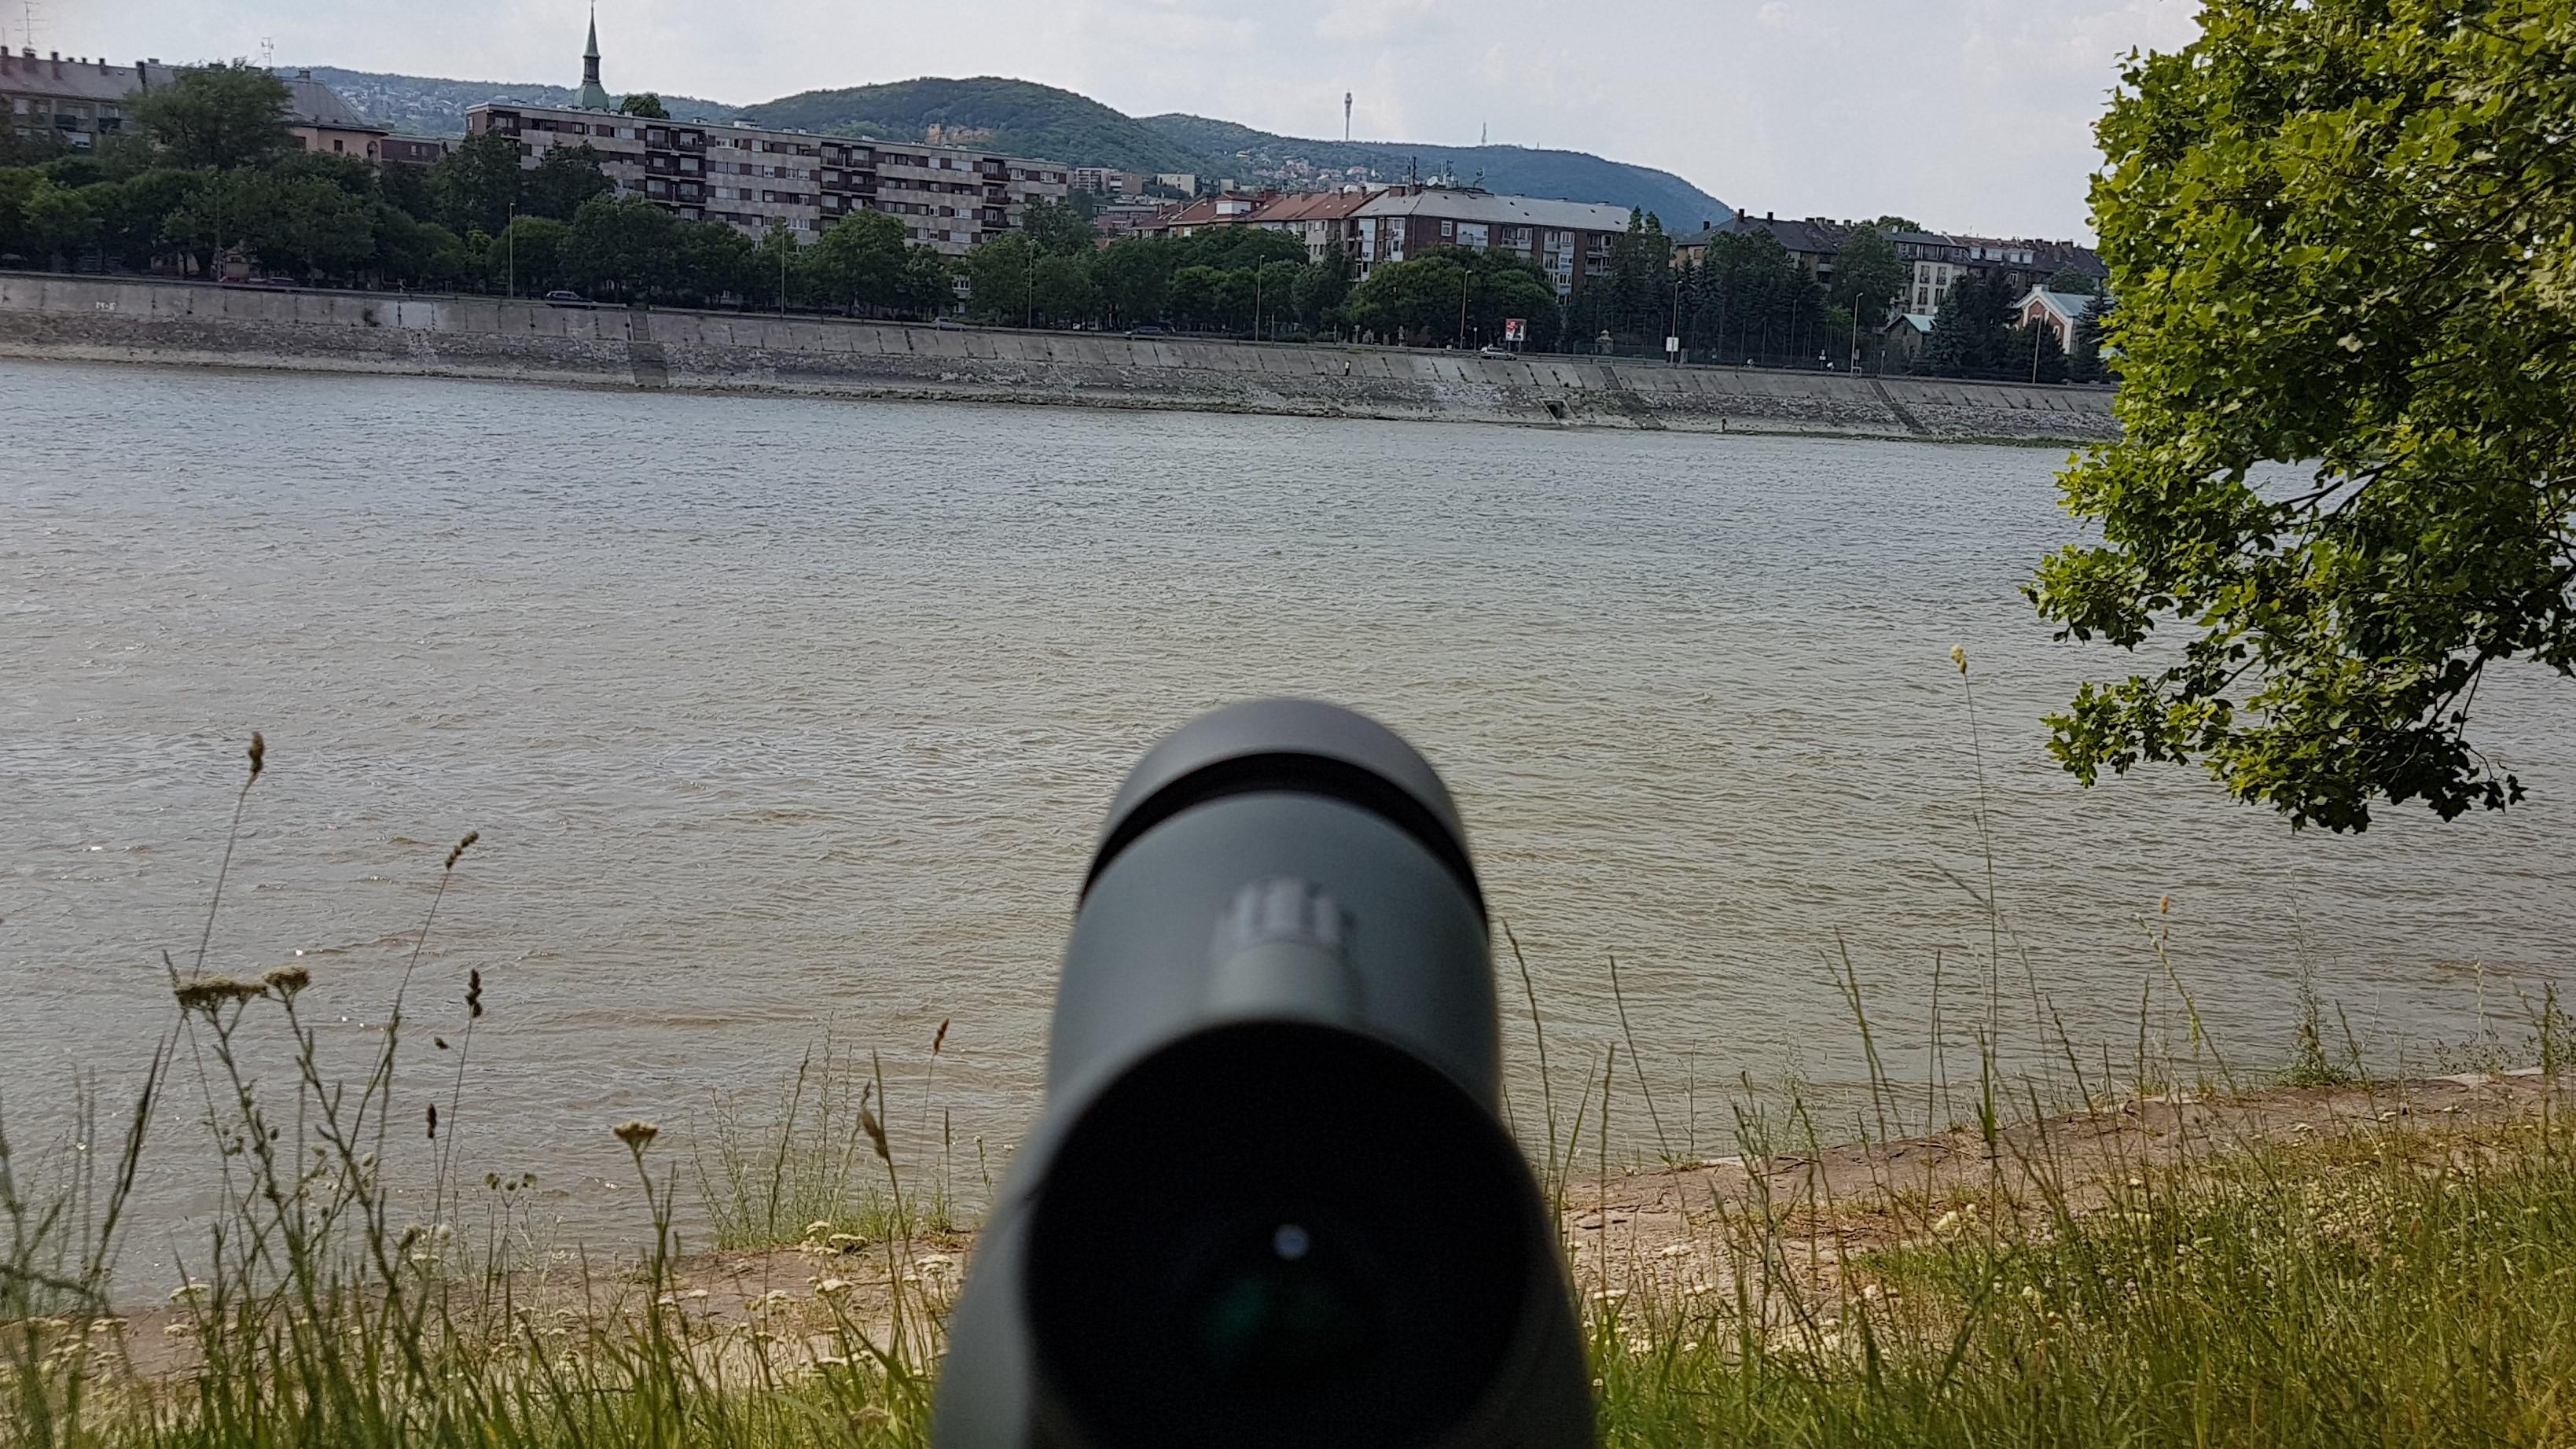 torony-normal-tavcso-eyebre-20-60x60-tavcso-spektiv-latcso-monocular-megfigyelo-vadasz-loter-madar-figyelo-termeszet-kirandulas-spective-allvany-01.JPG